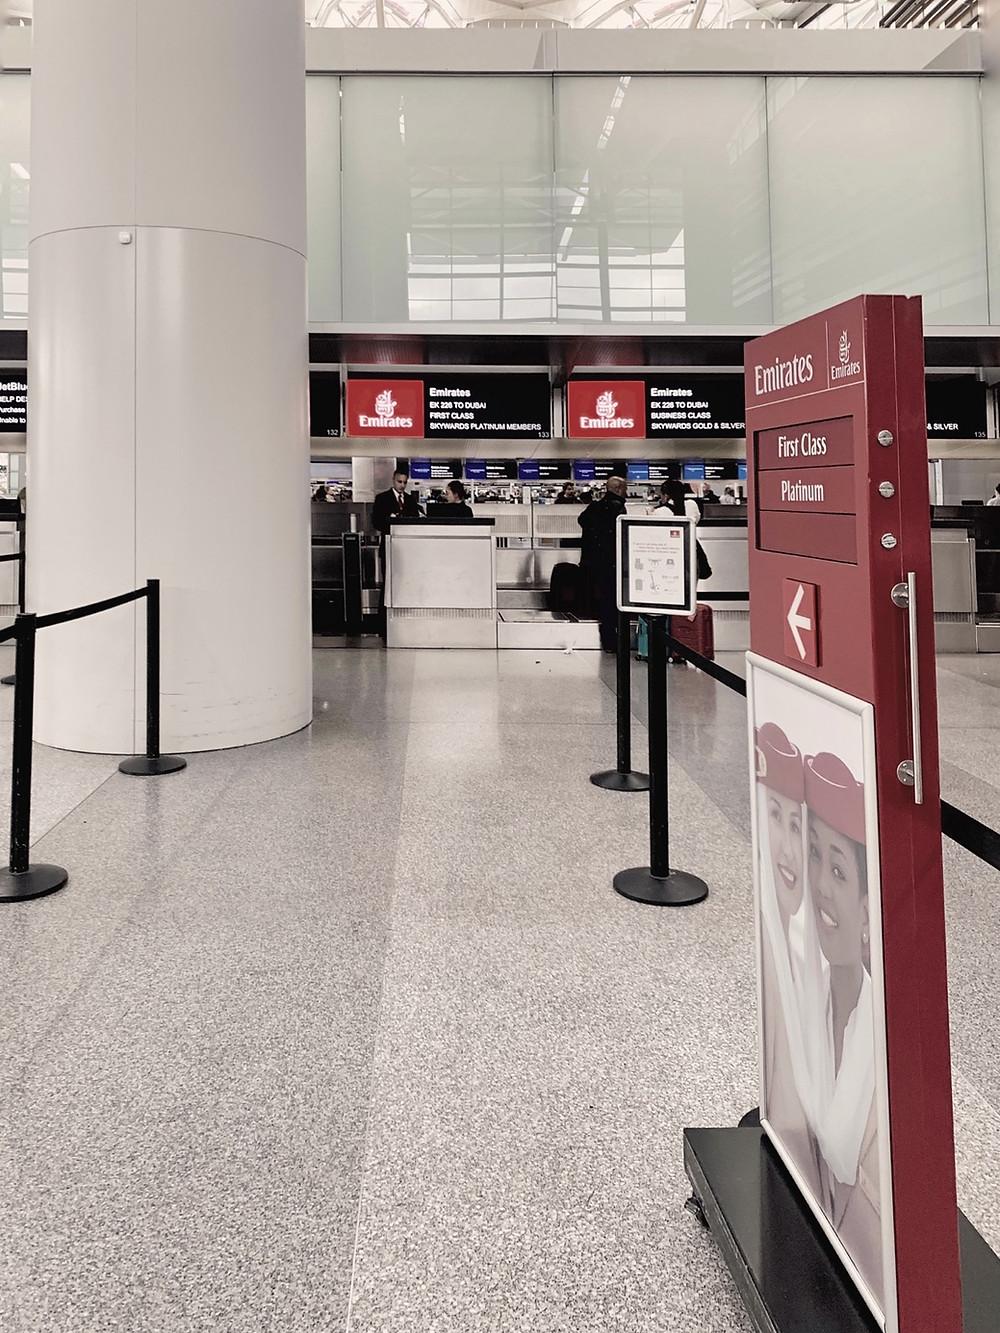 Emirates First Class San Francisco - Dubai, SFO Check-In Desk